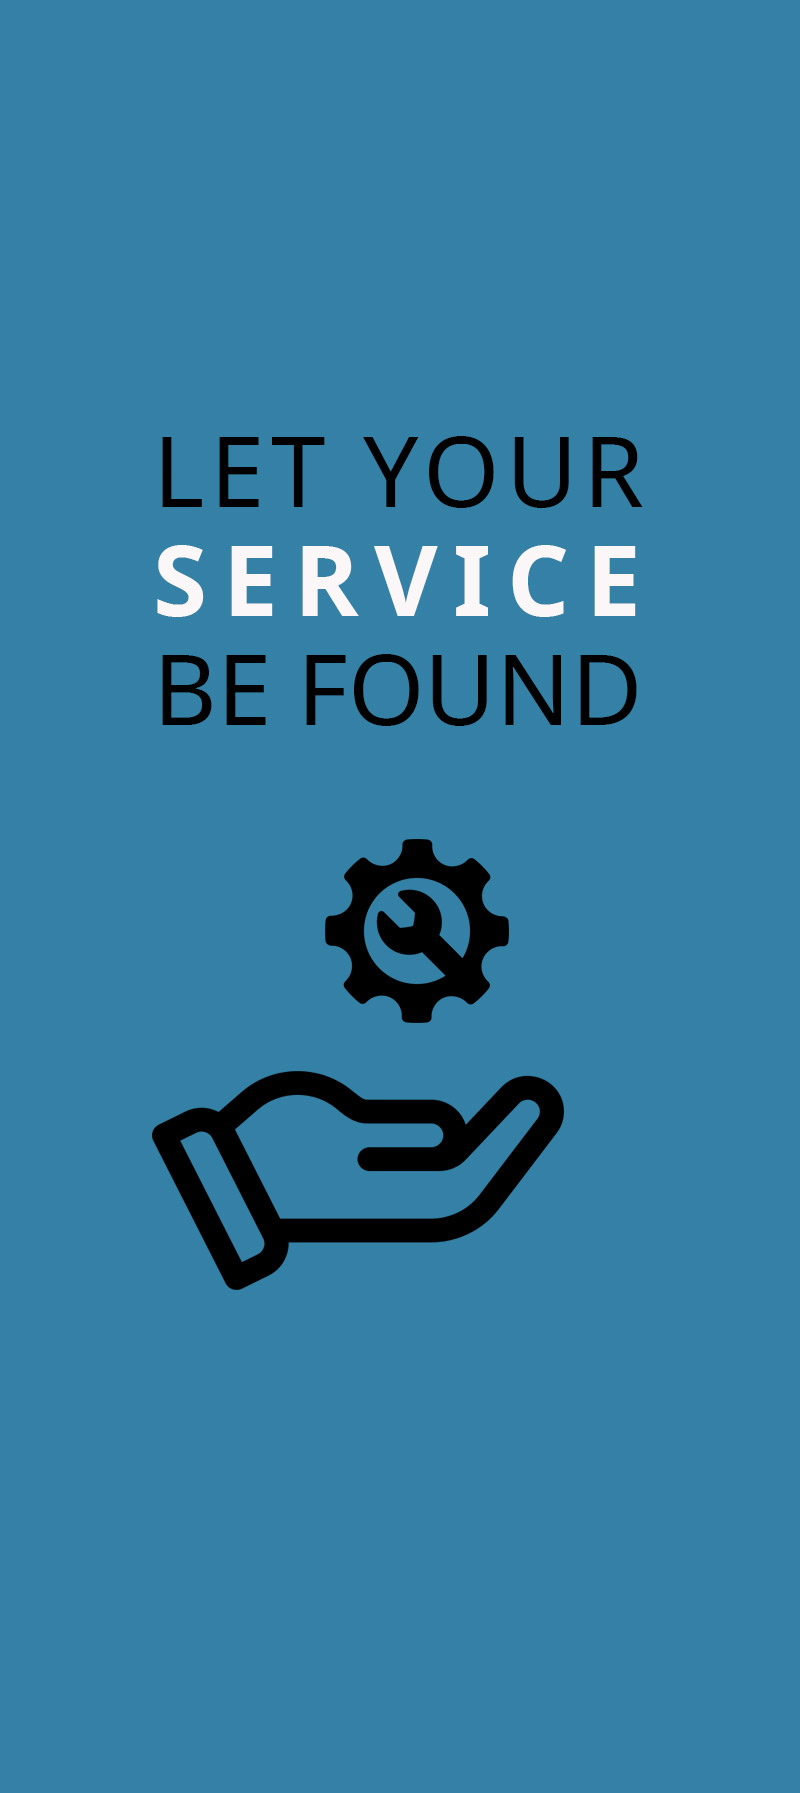 let your service found sri lanka